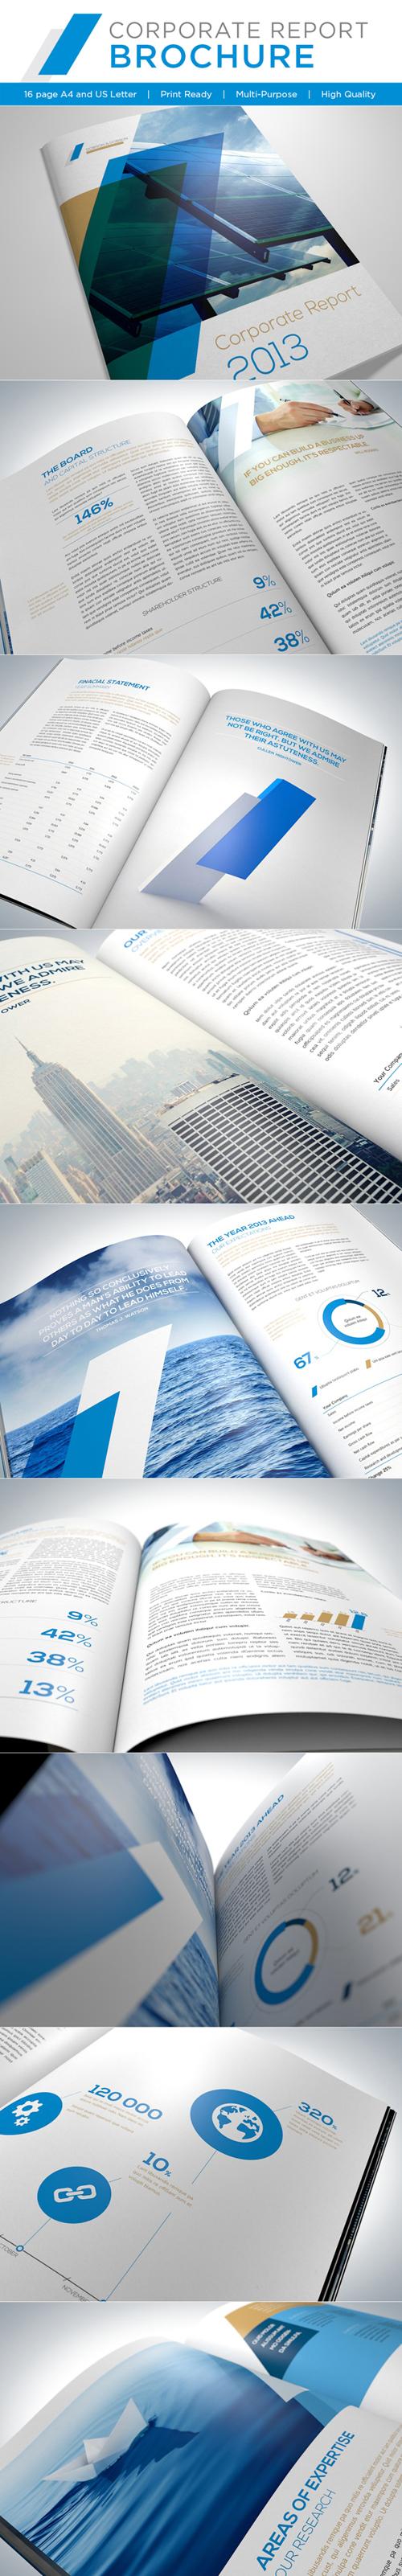 Corporate Report Brochure Design